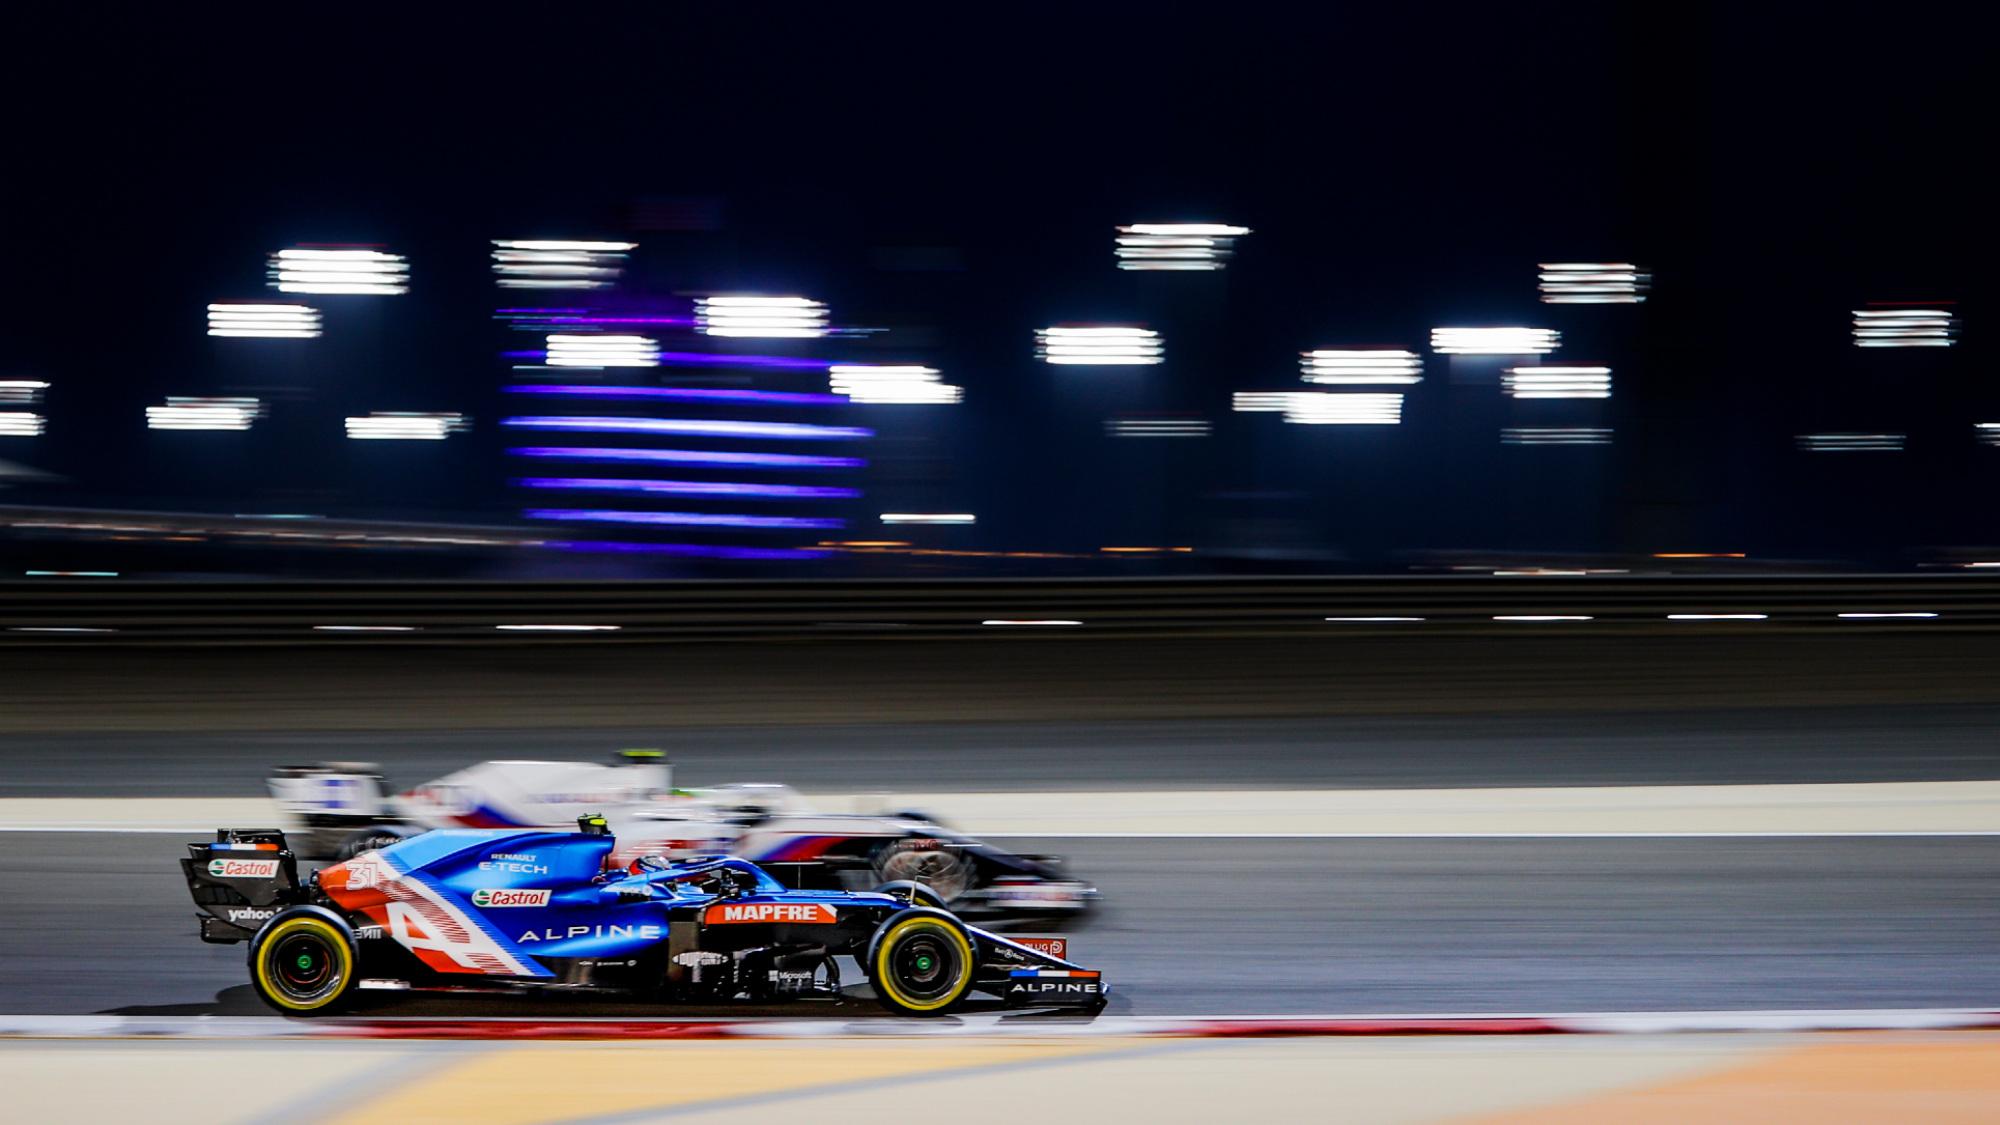 Fernando Alonso, ALpine, 2021 Bahrain GP FP2